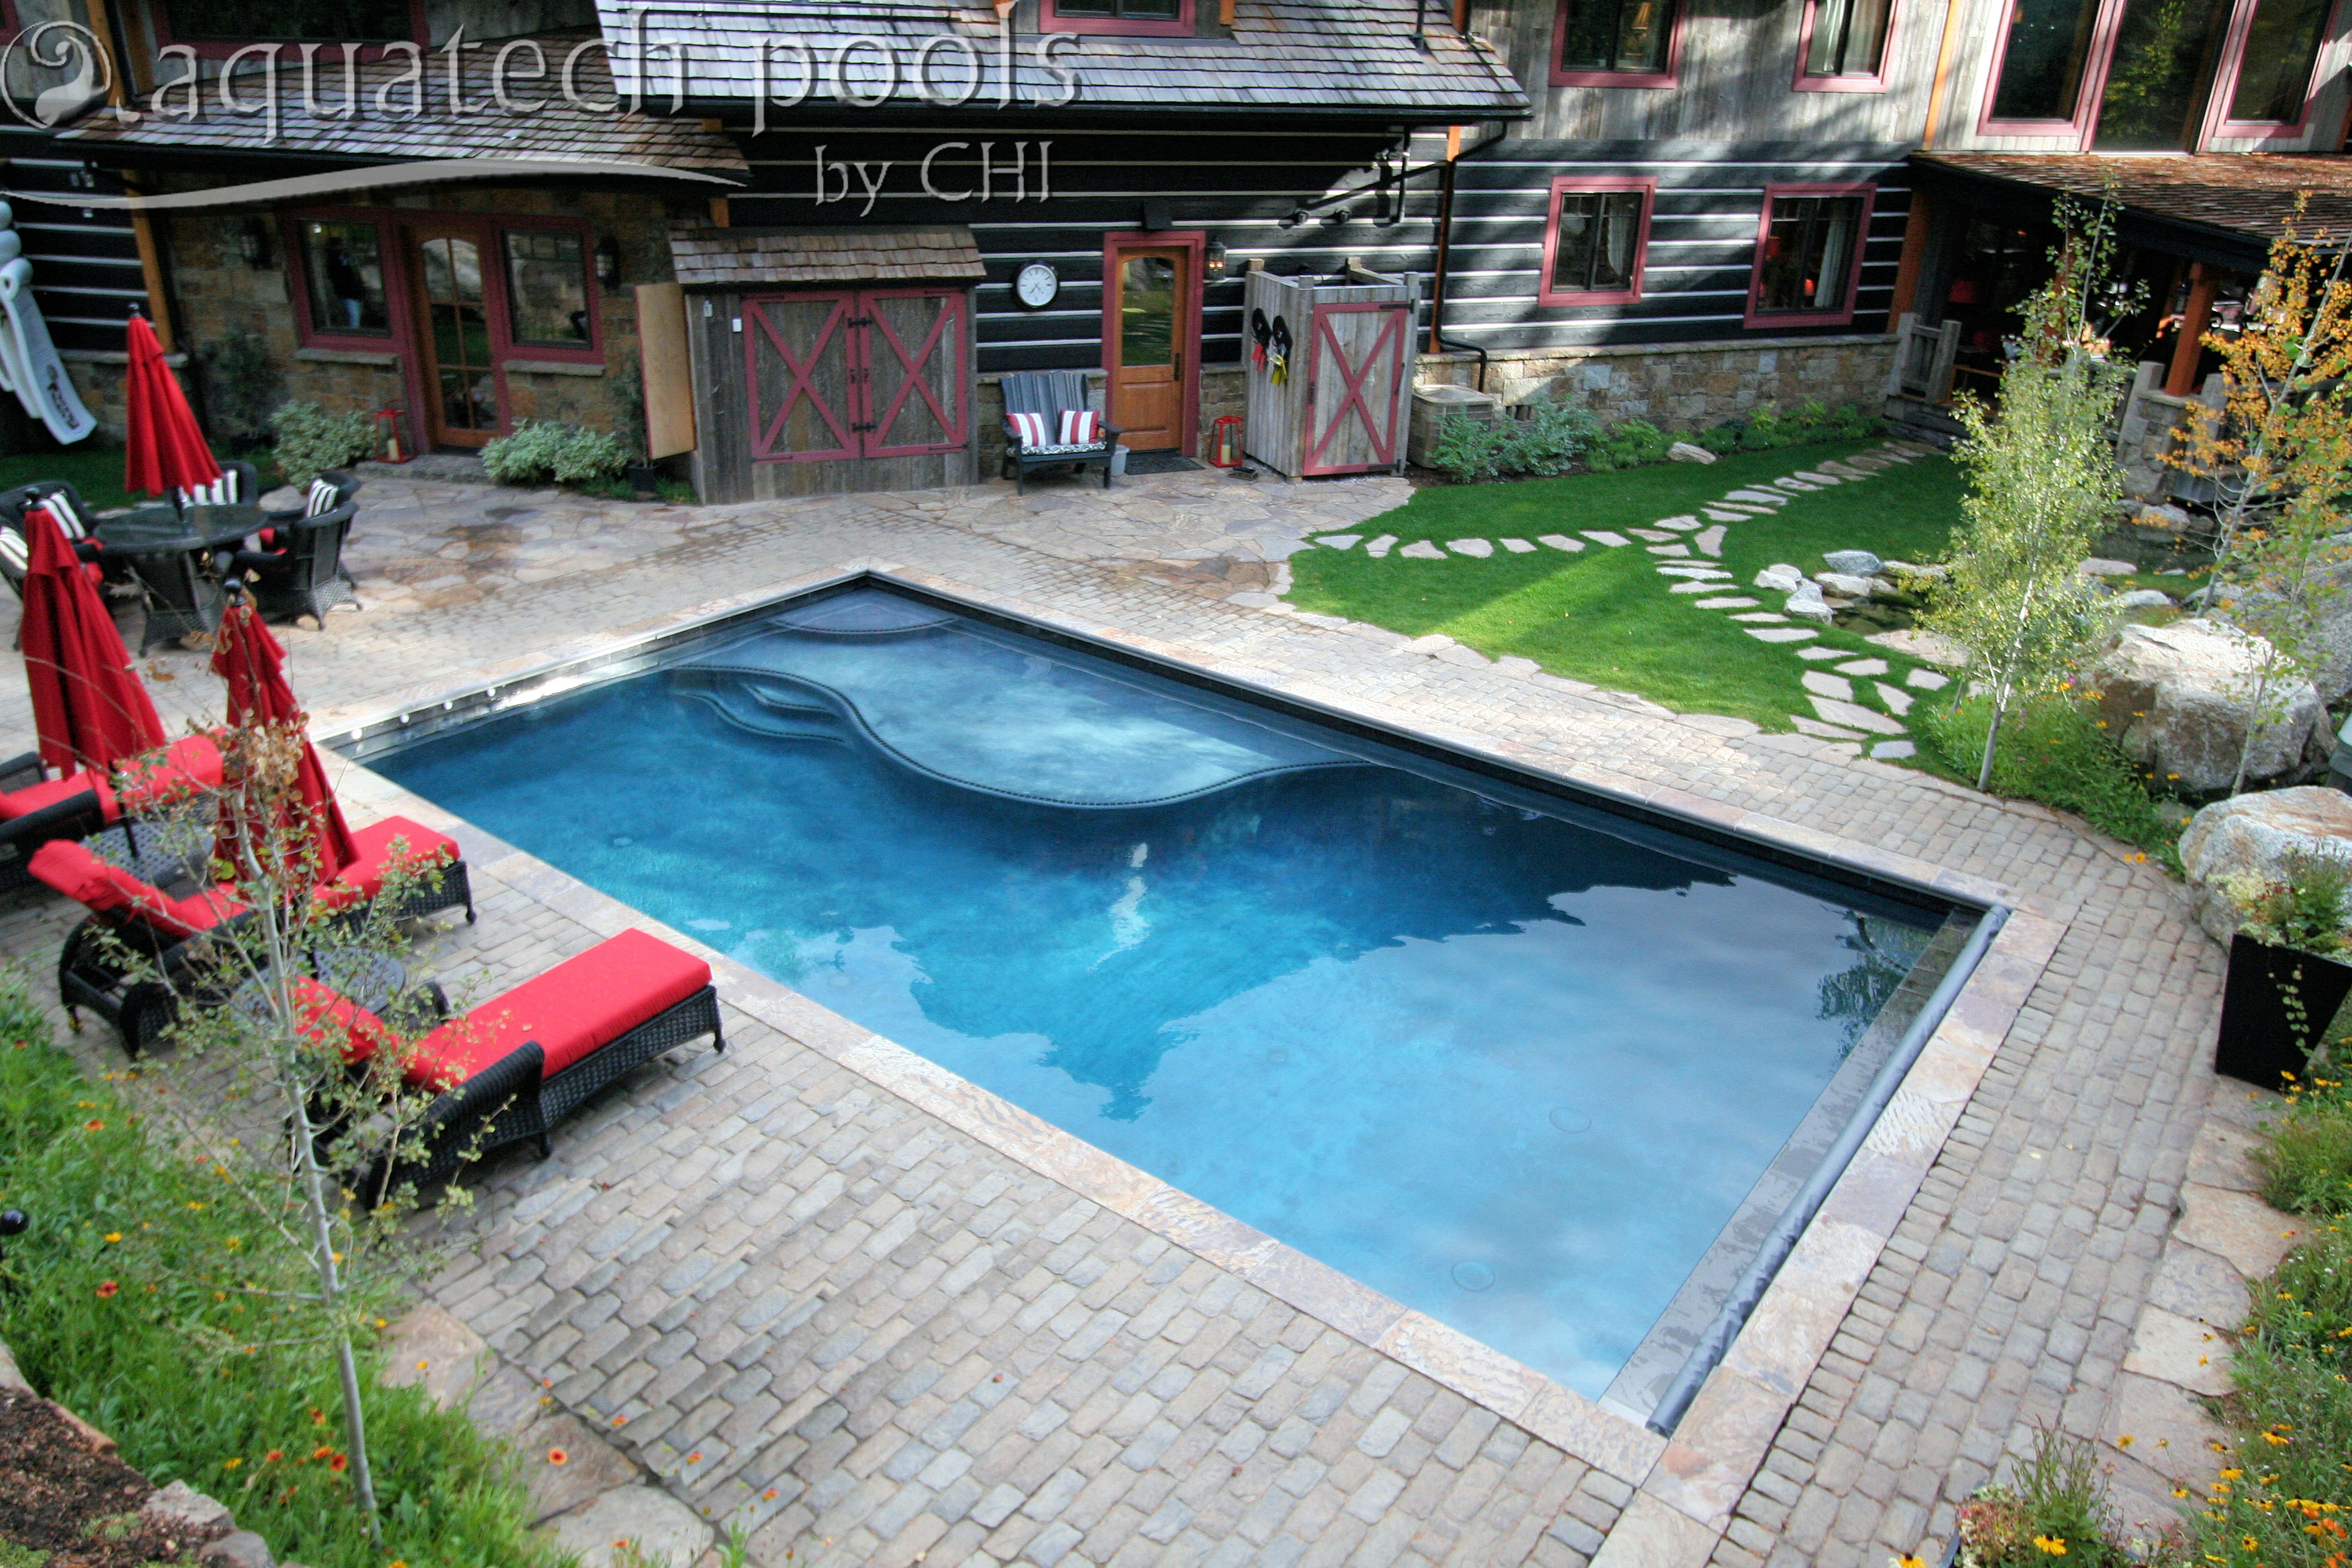 Patio pool with a sun shelf